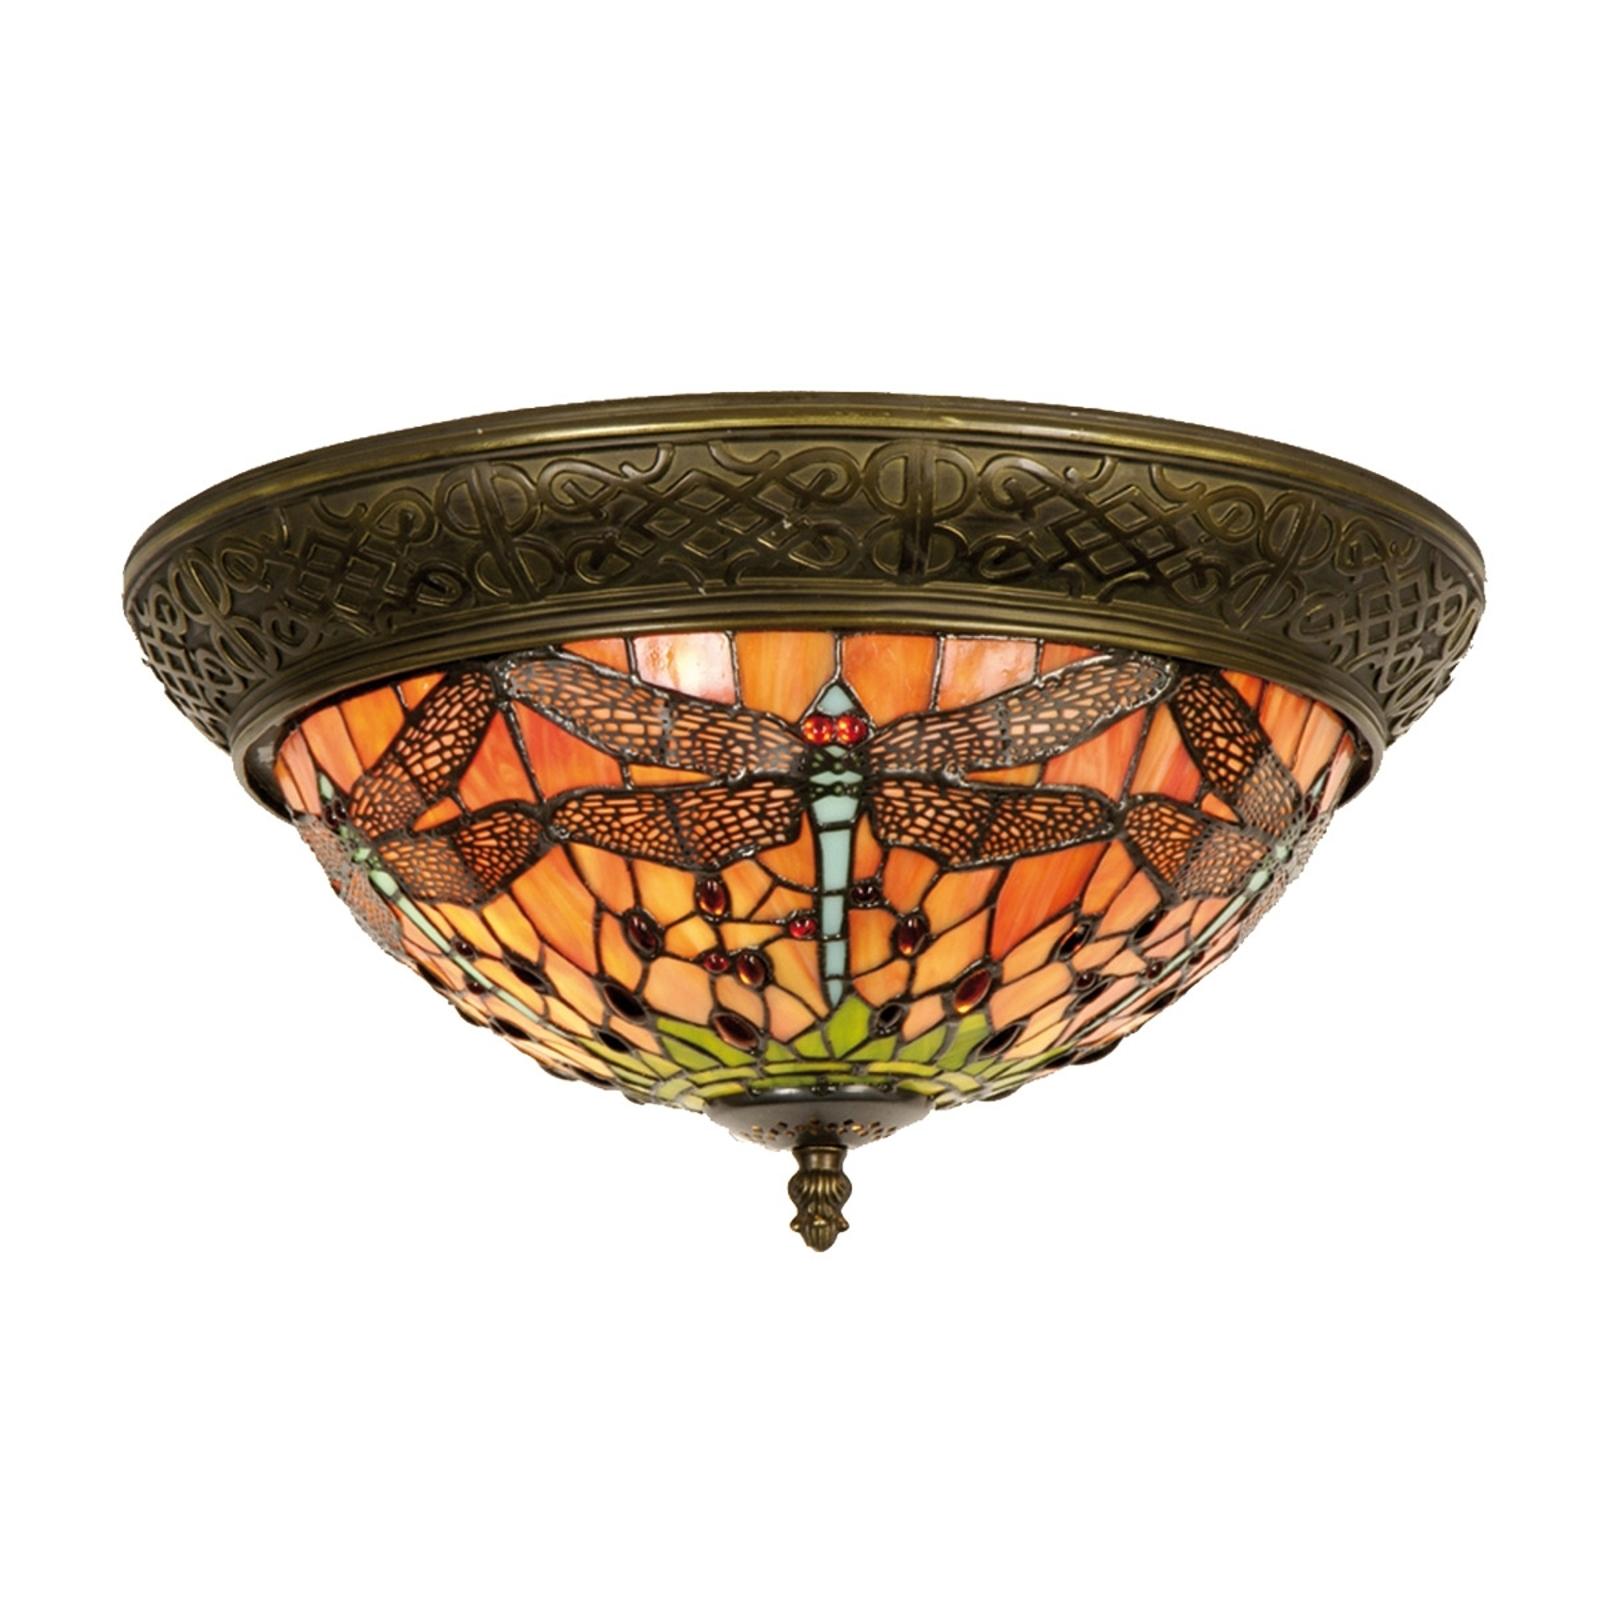 Schitterende plafondlamp Bella Tiffany, 38 cm